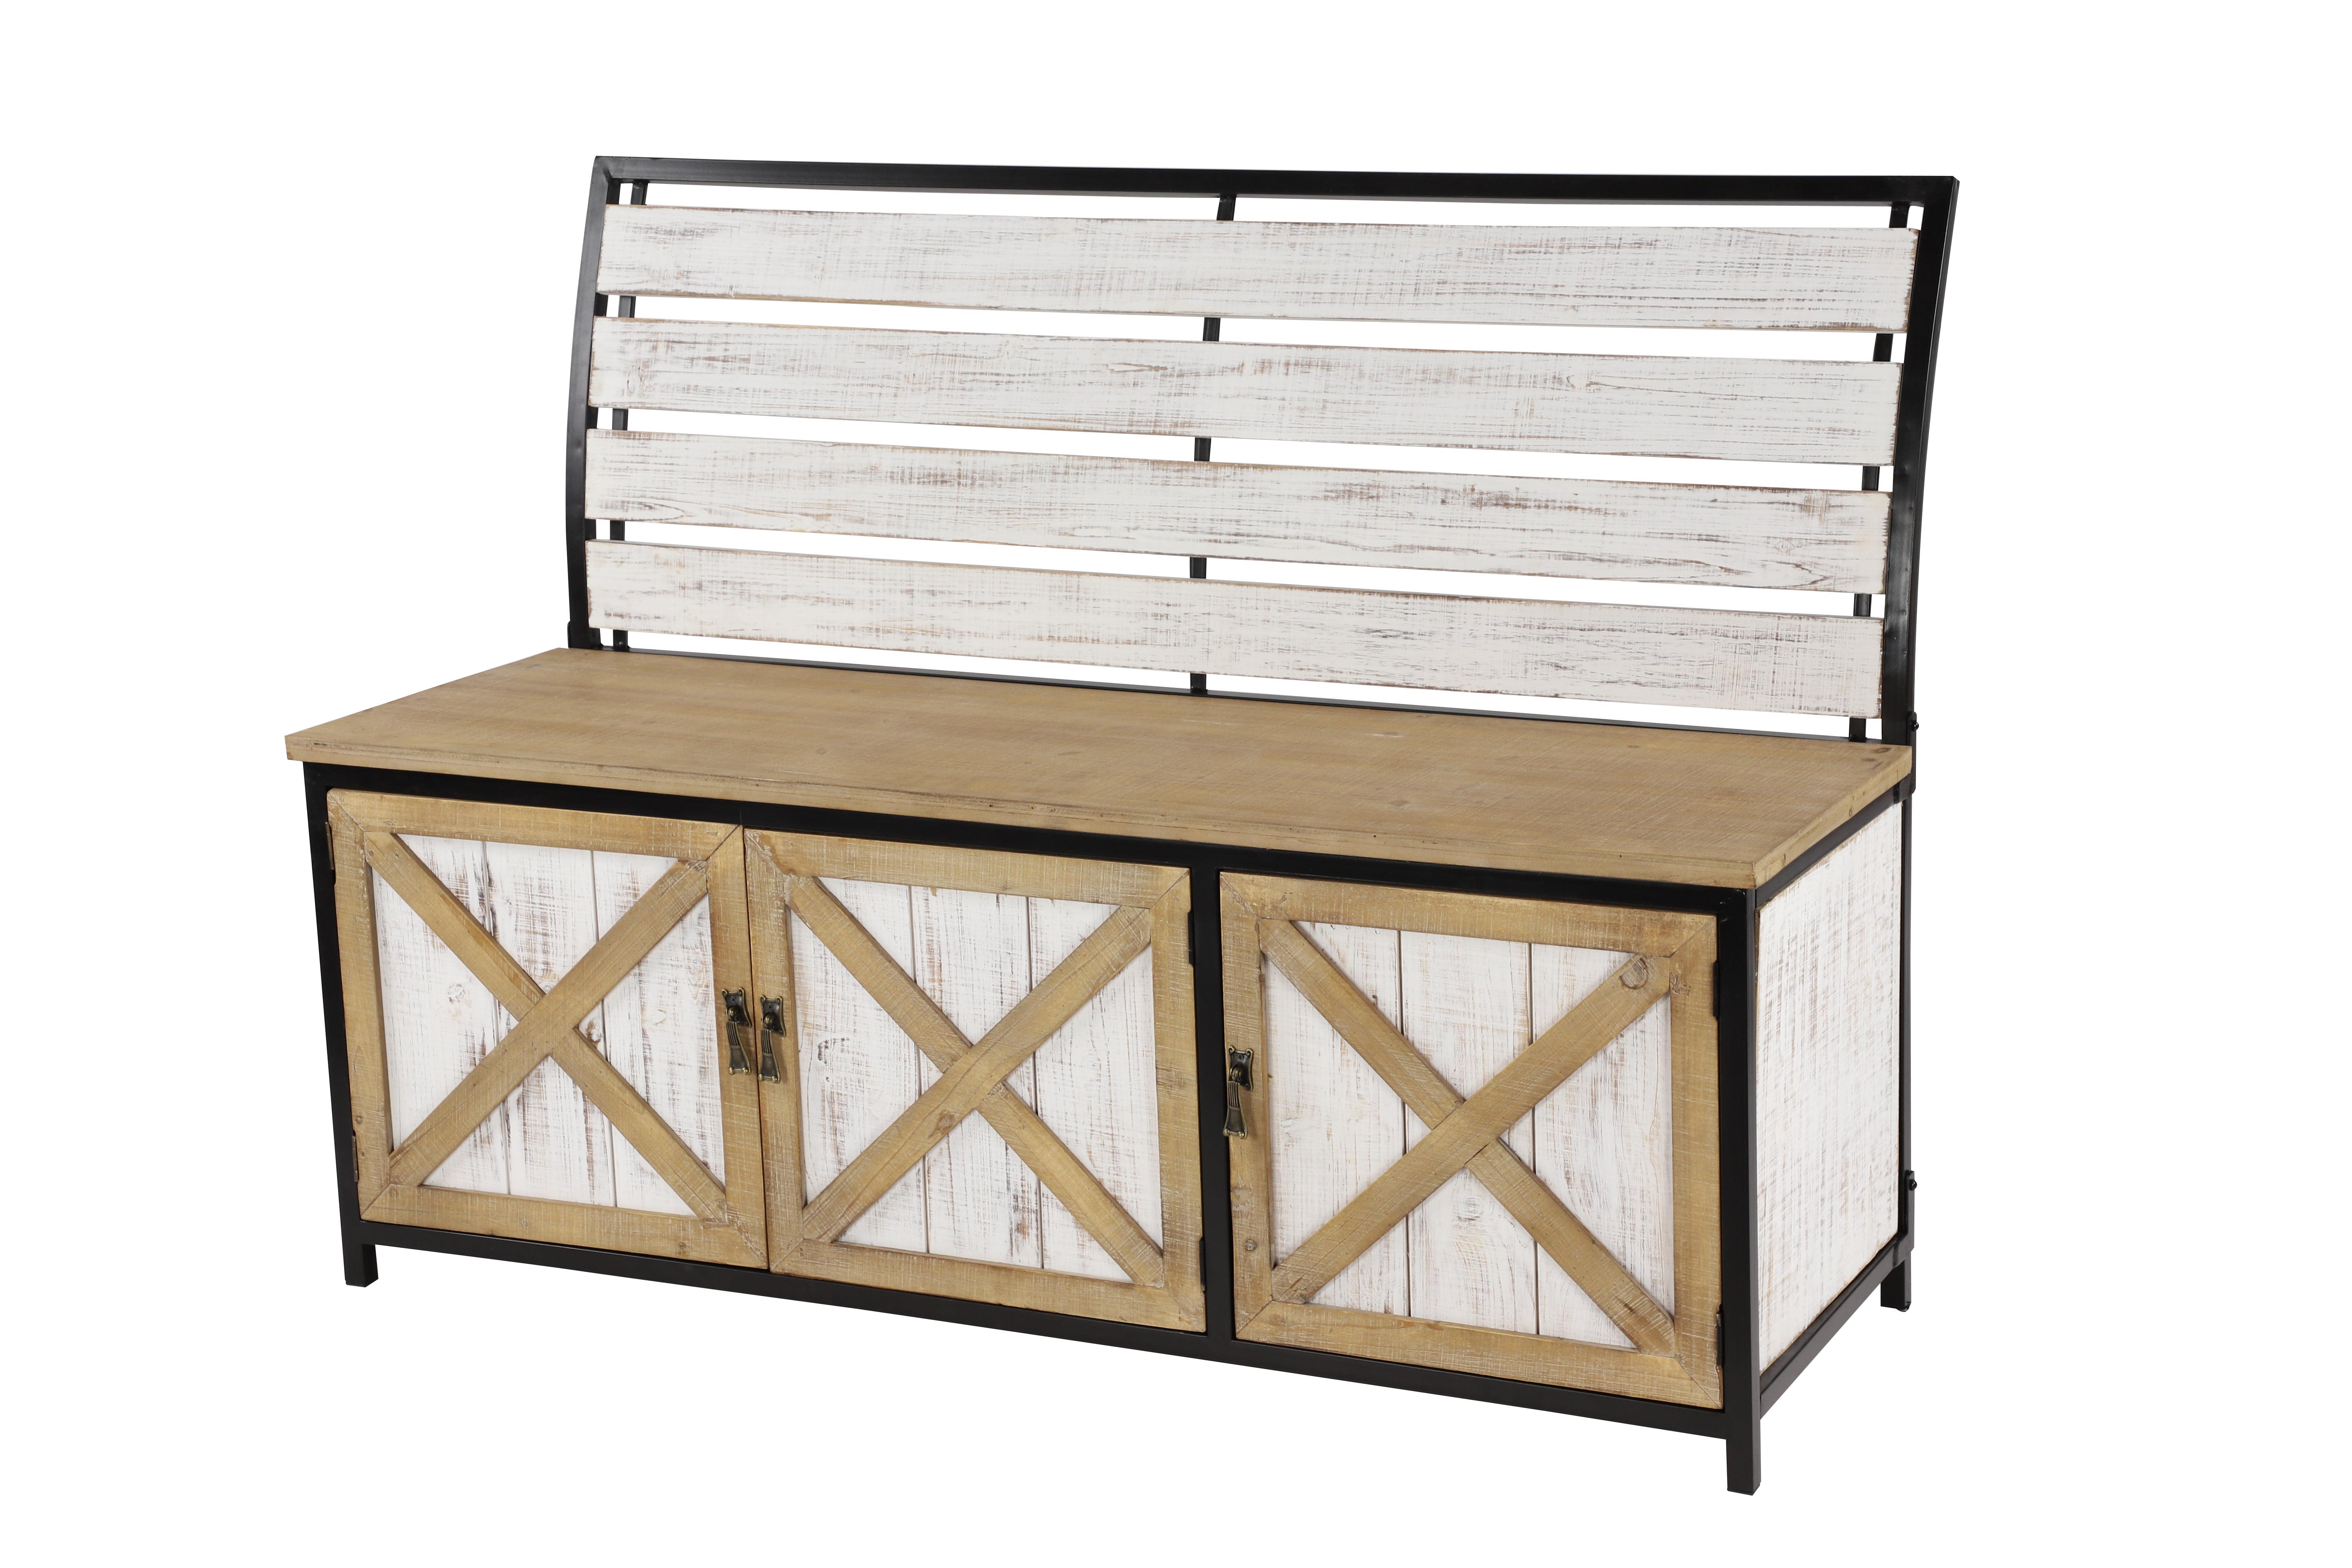 Decmode Natural White Black Iron Wood Storage Bench W Seat Back 48 X 35 Walmart Com Walmart Com